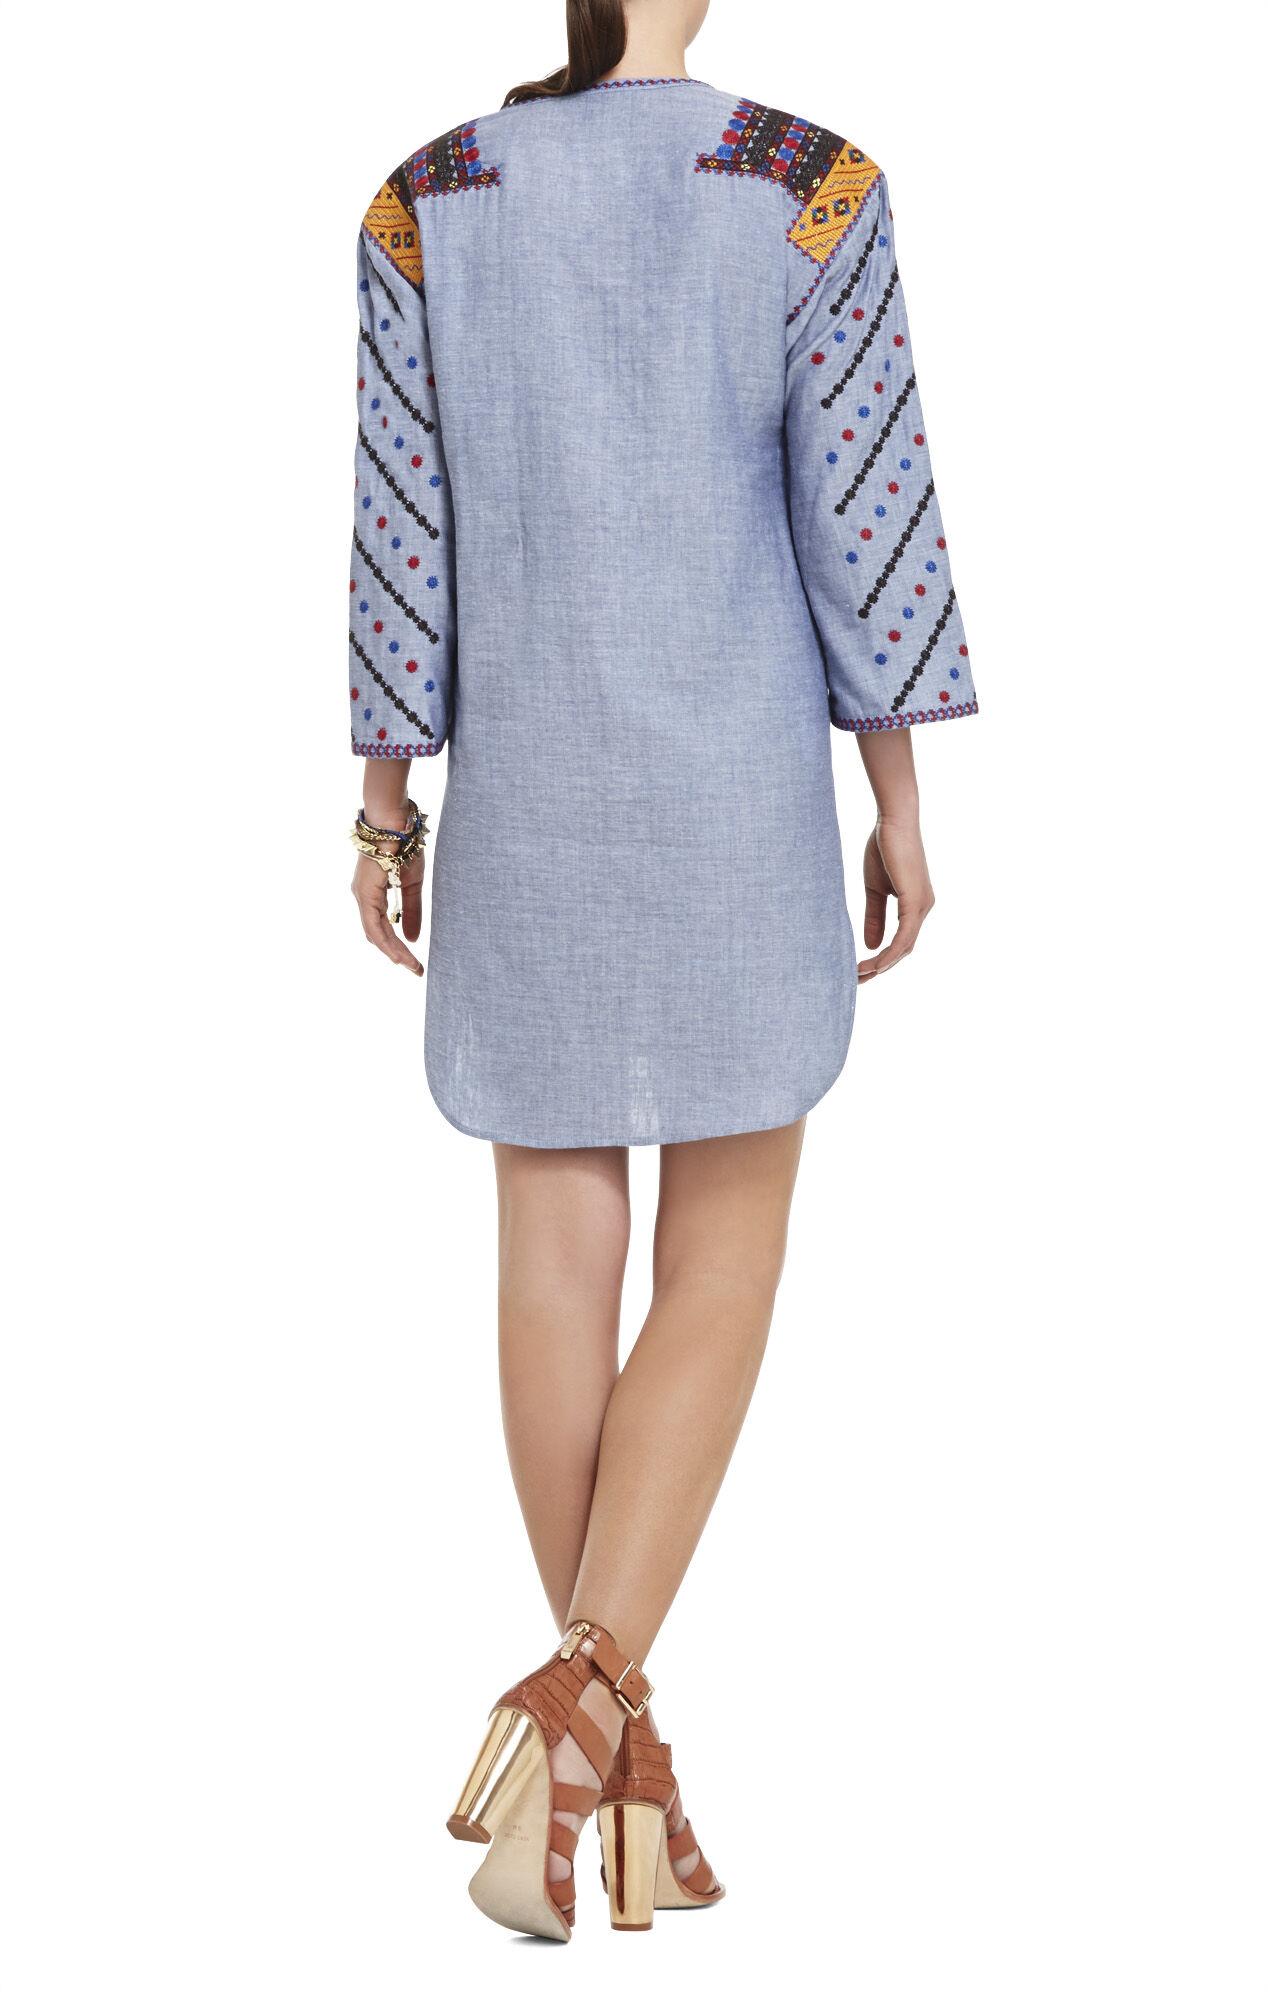 Aveena Embroidered Tunic